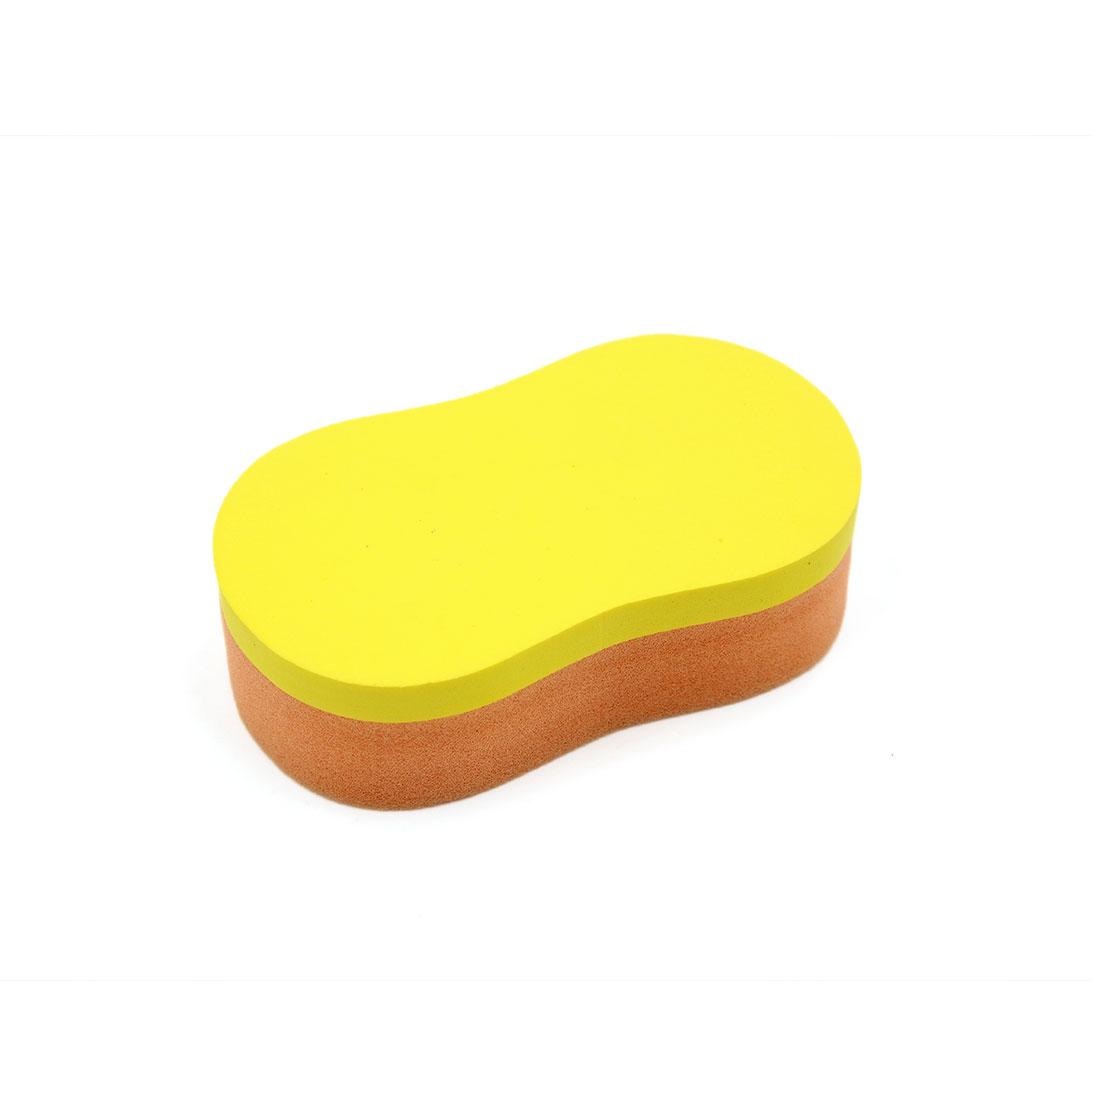 Yellow Foam Orange Sponge 8-Shaped Car Vehicle Waxing Buffing Tool Polishing Pad